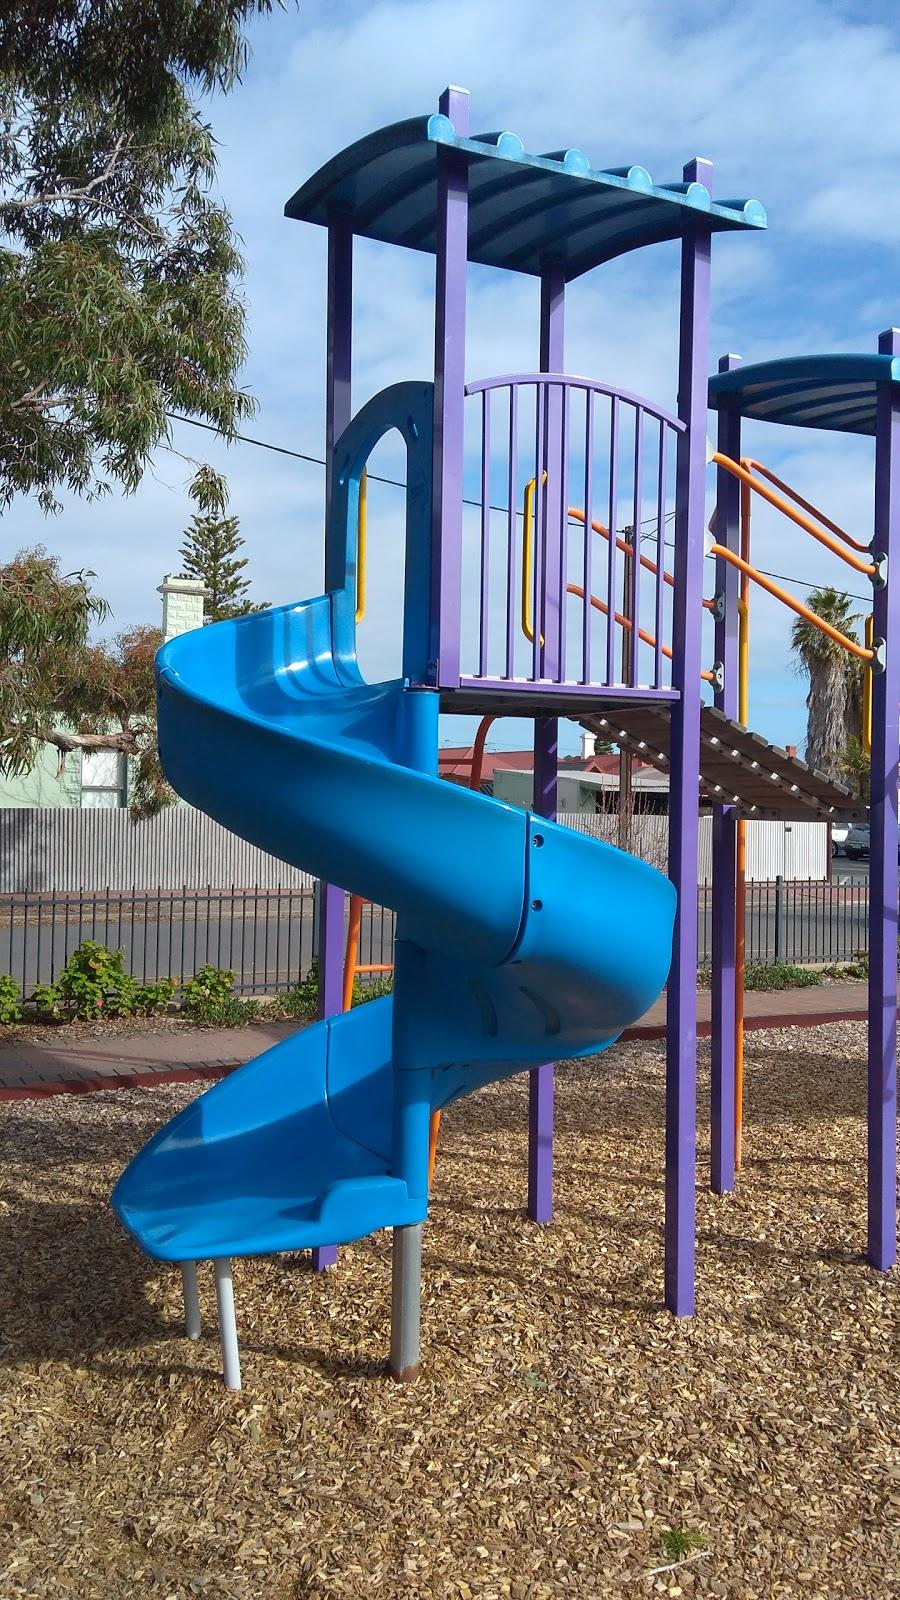 Baddams Green | park | 4-4A Baker St, Glenelg South SA 5045, Australia